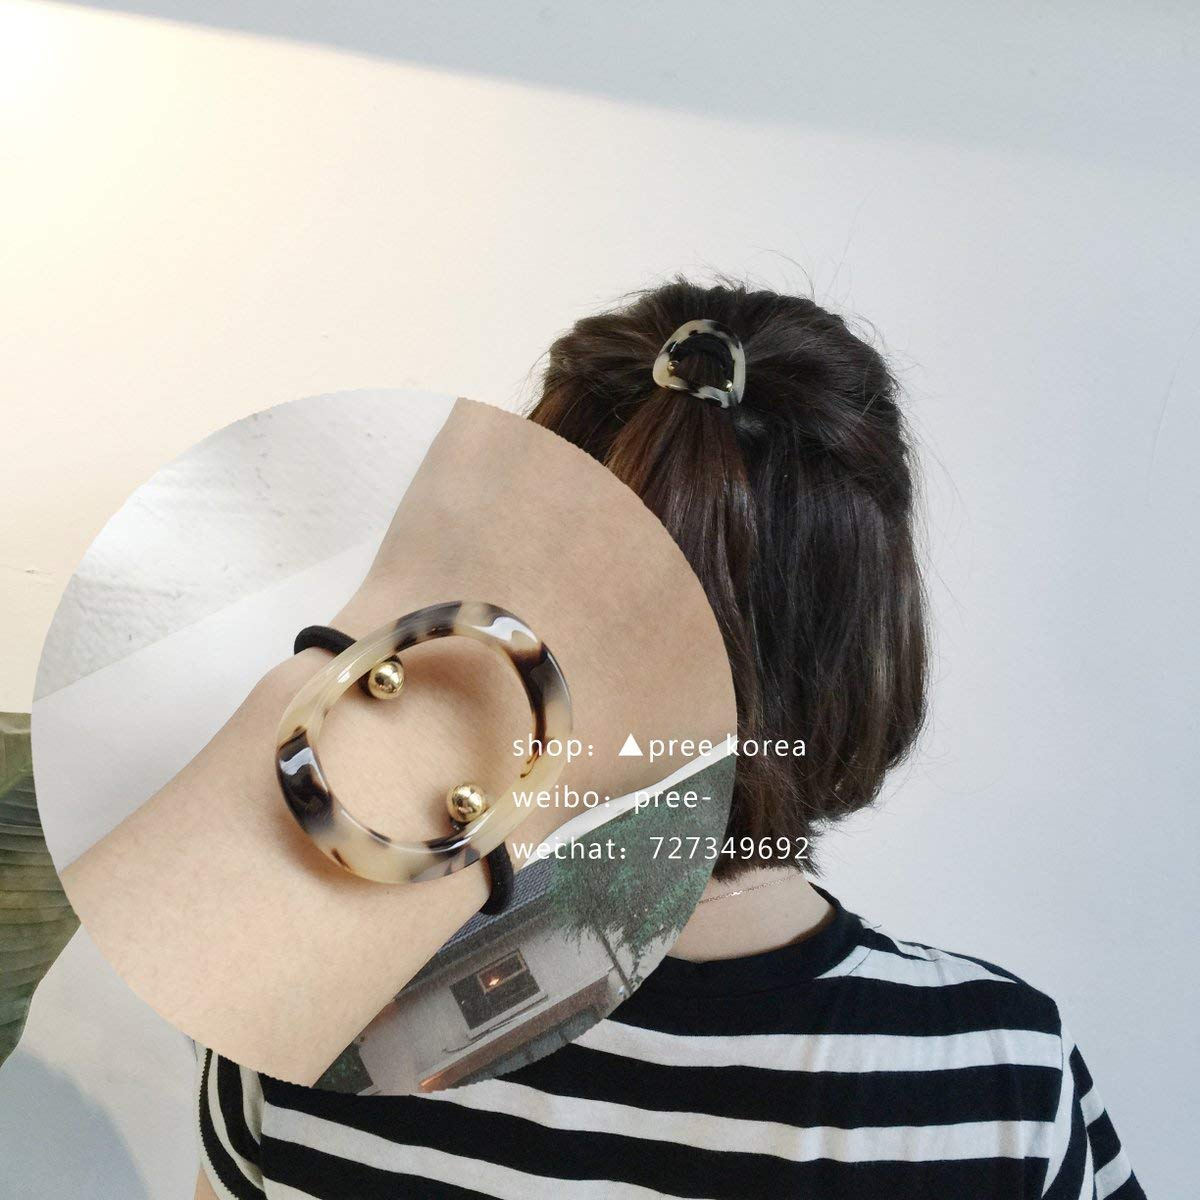 usongs Korea hawksbill rings and simple light brown hair ring Tousheng elegant route Acrylic